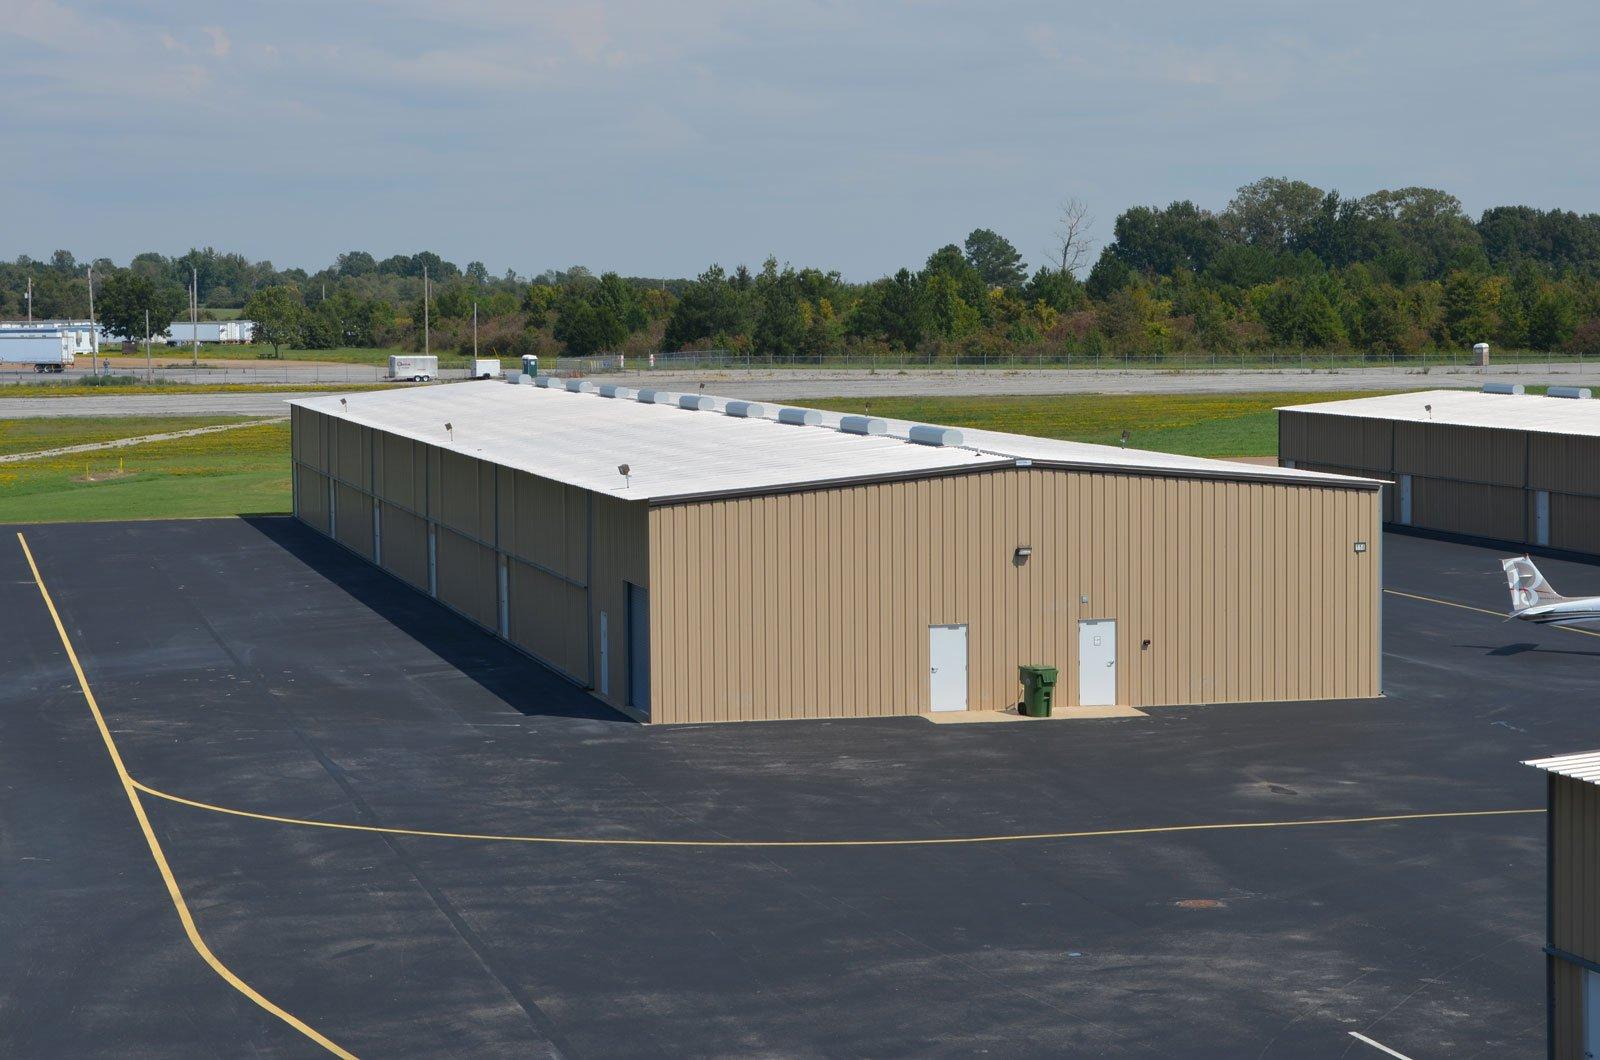 Image of a T-hangar at the Memphis Millington Airport